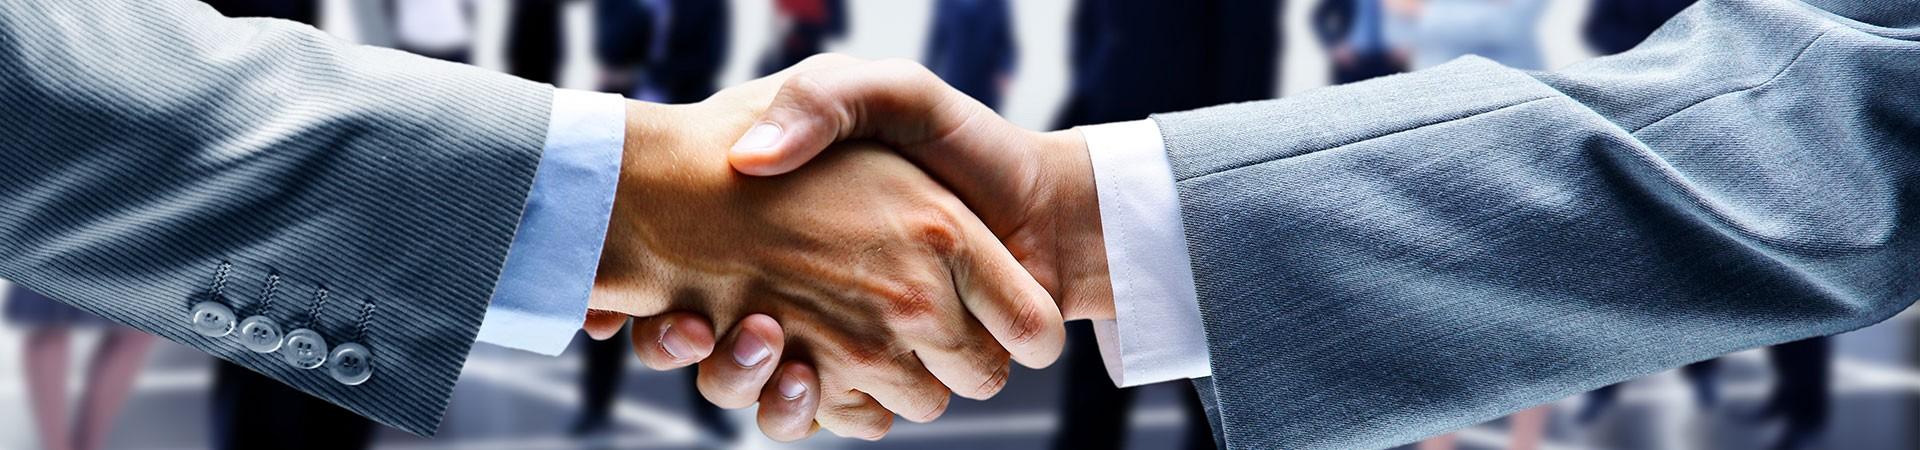 mbc consulting - Nos partenaires